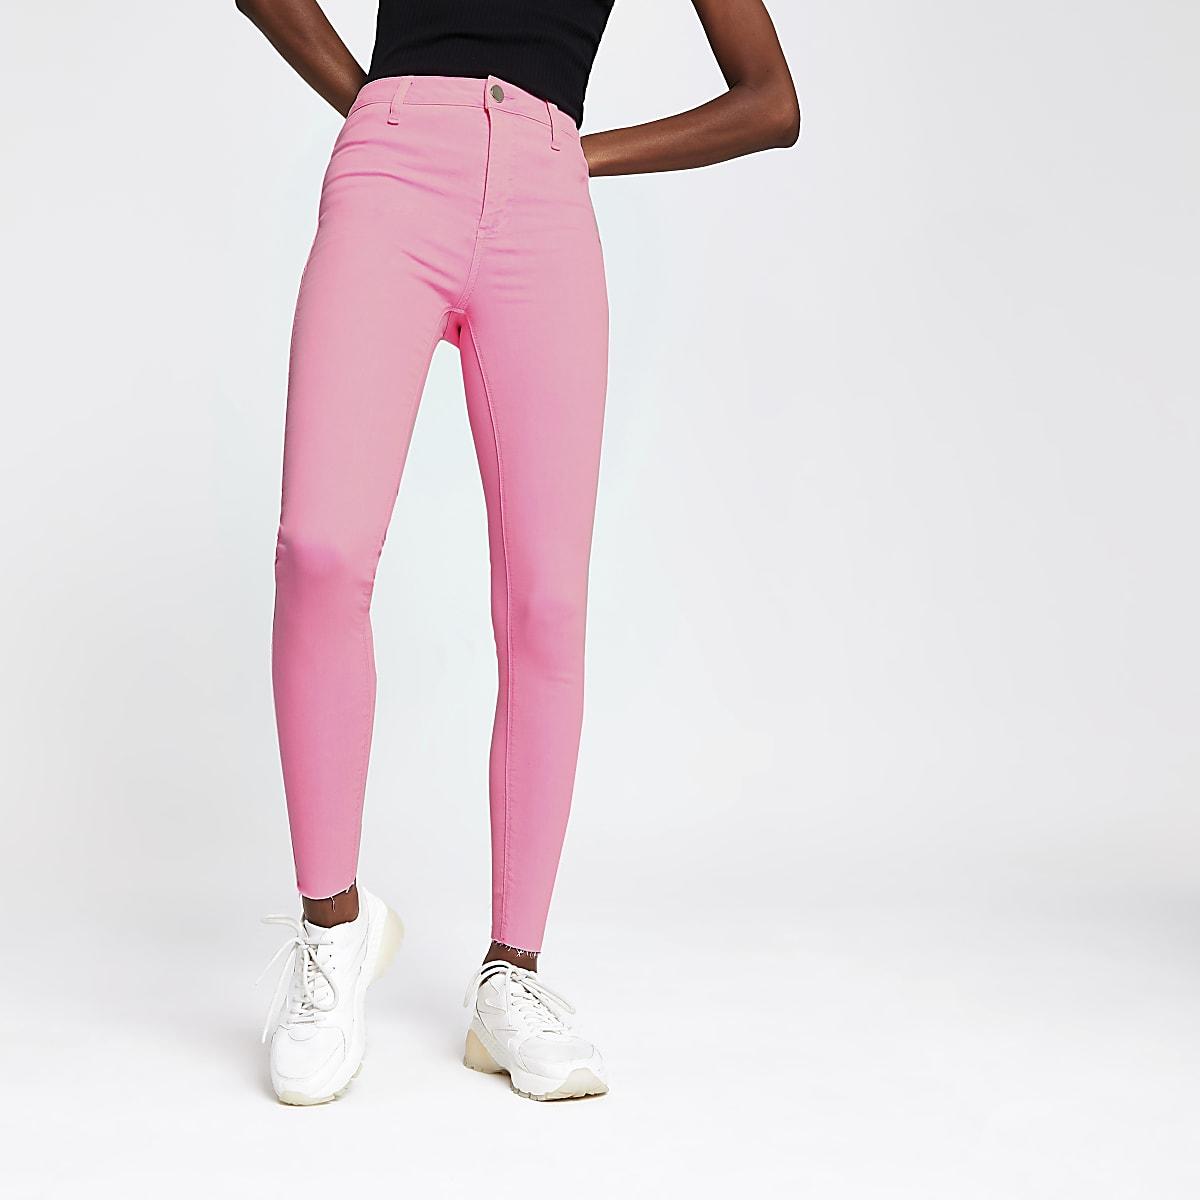 Neon pink Kaia high rise disco jeans